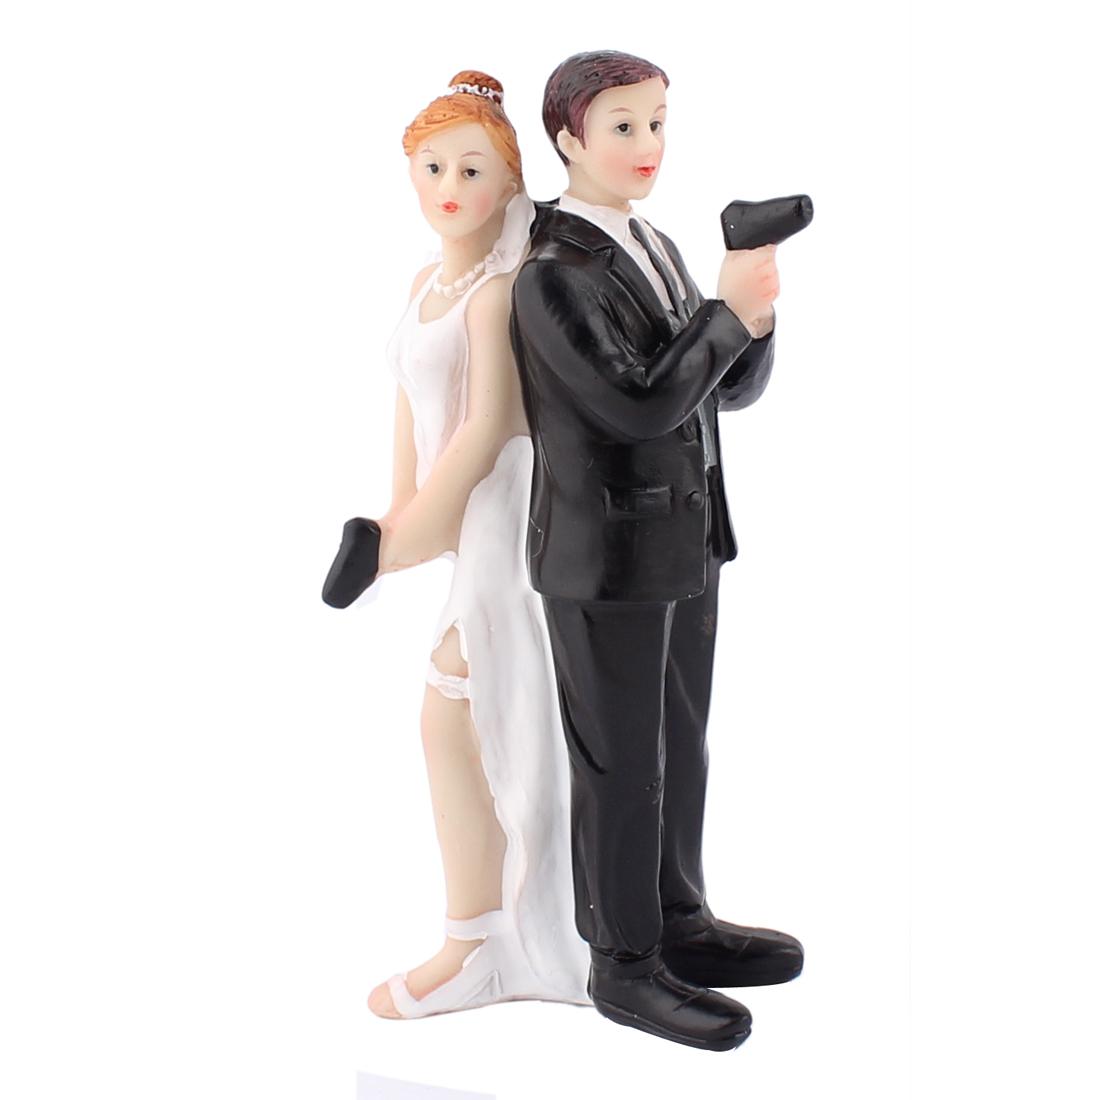 Gun Bride Groom Couple Humor Favor Figurine Wedding Cake Topper Decoration Gift